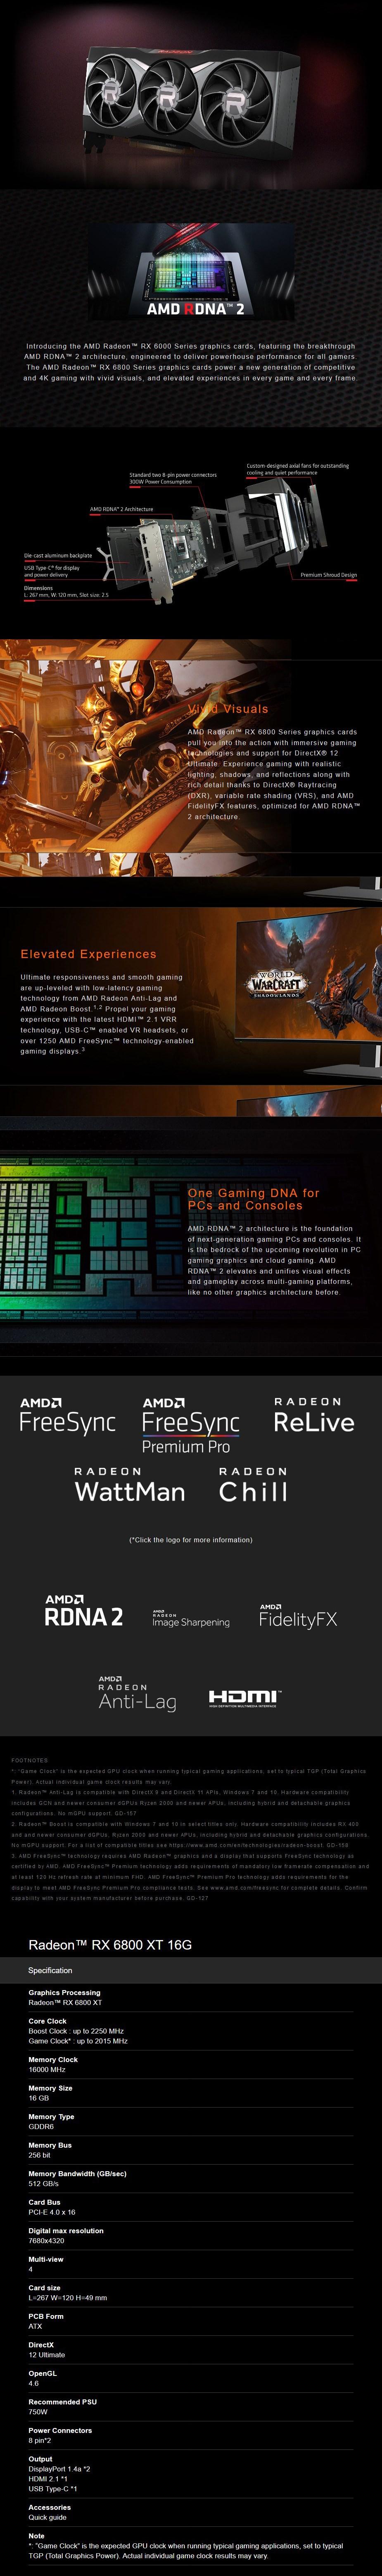 MSI Radeon RX 6800 XT 16GB Video Card - Overview 1